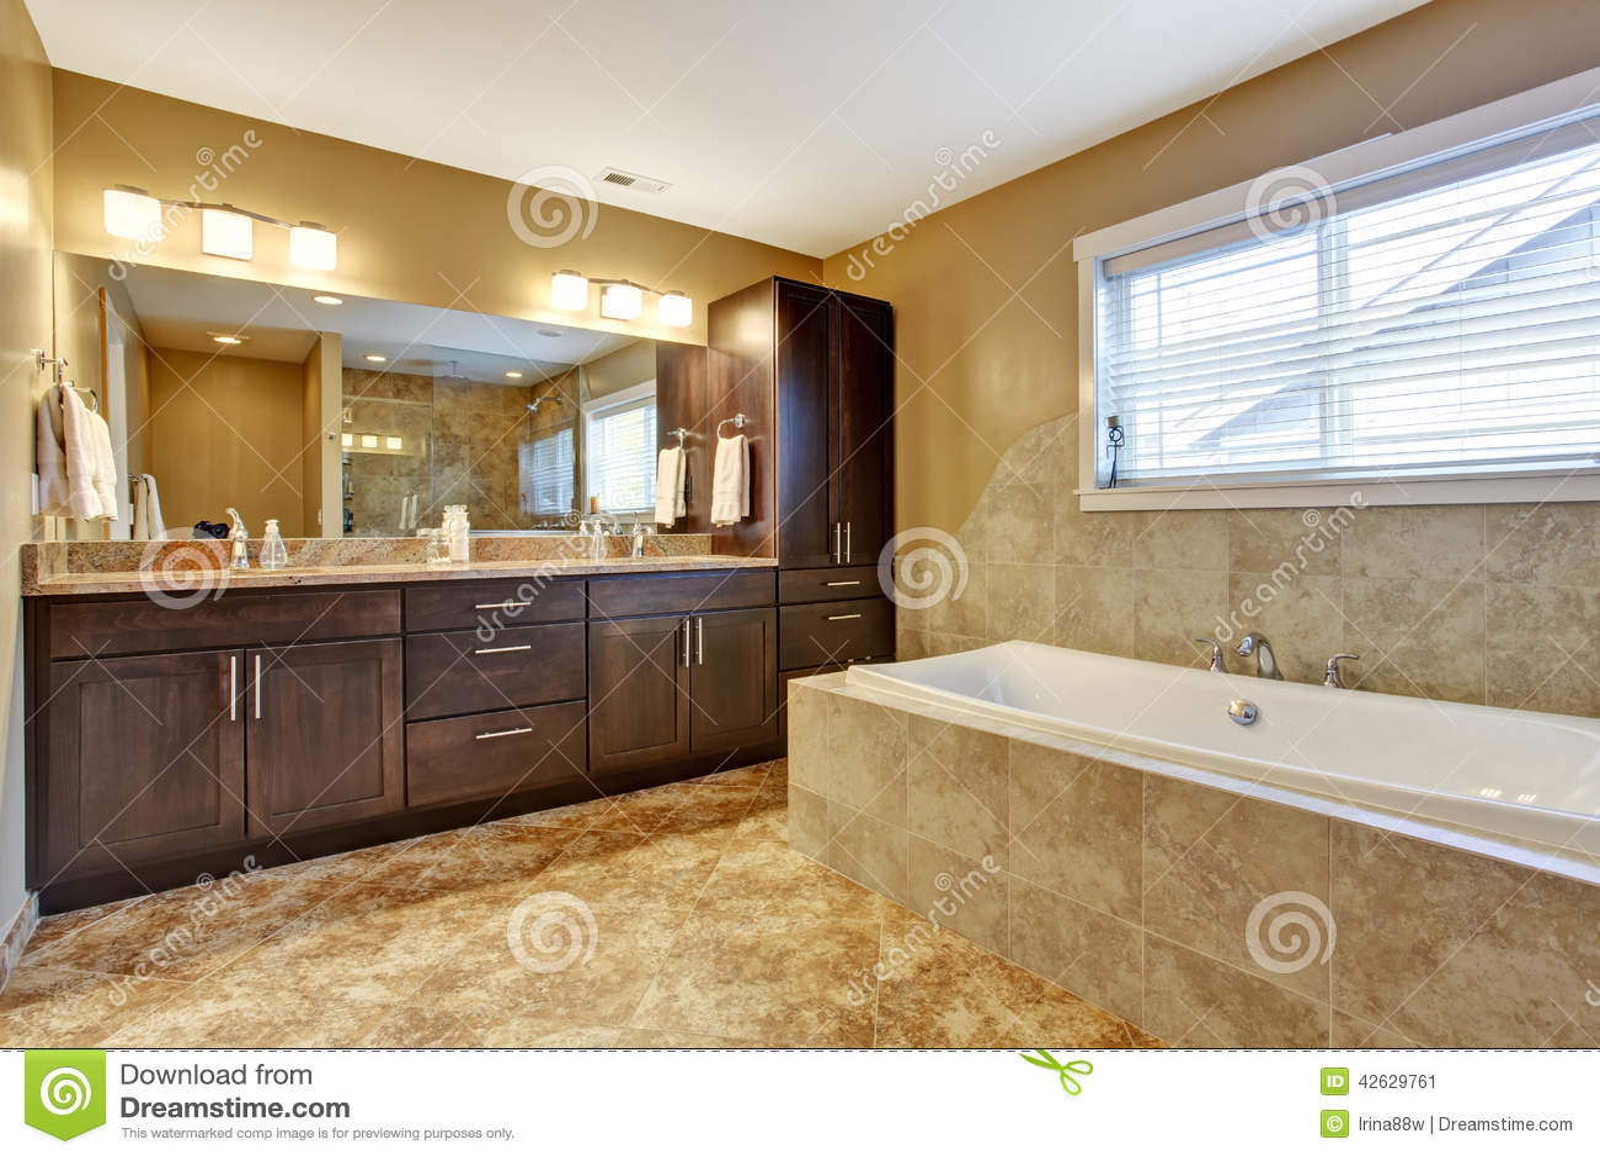 modern bathroom interior with dark brown cabinets stock photo image